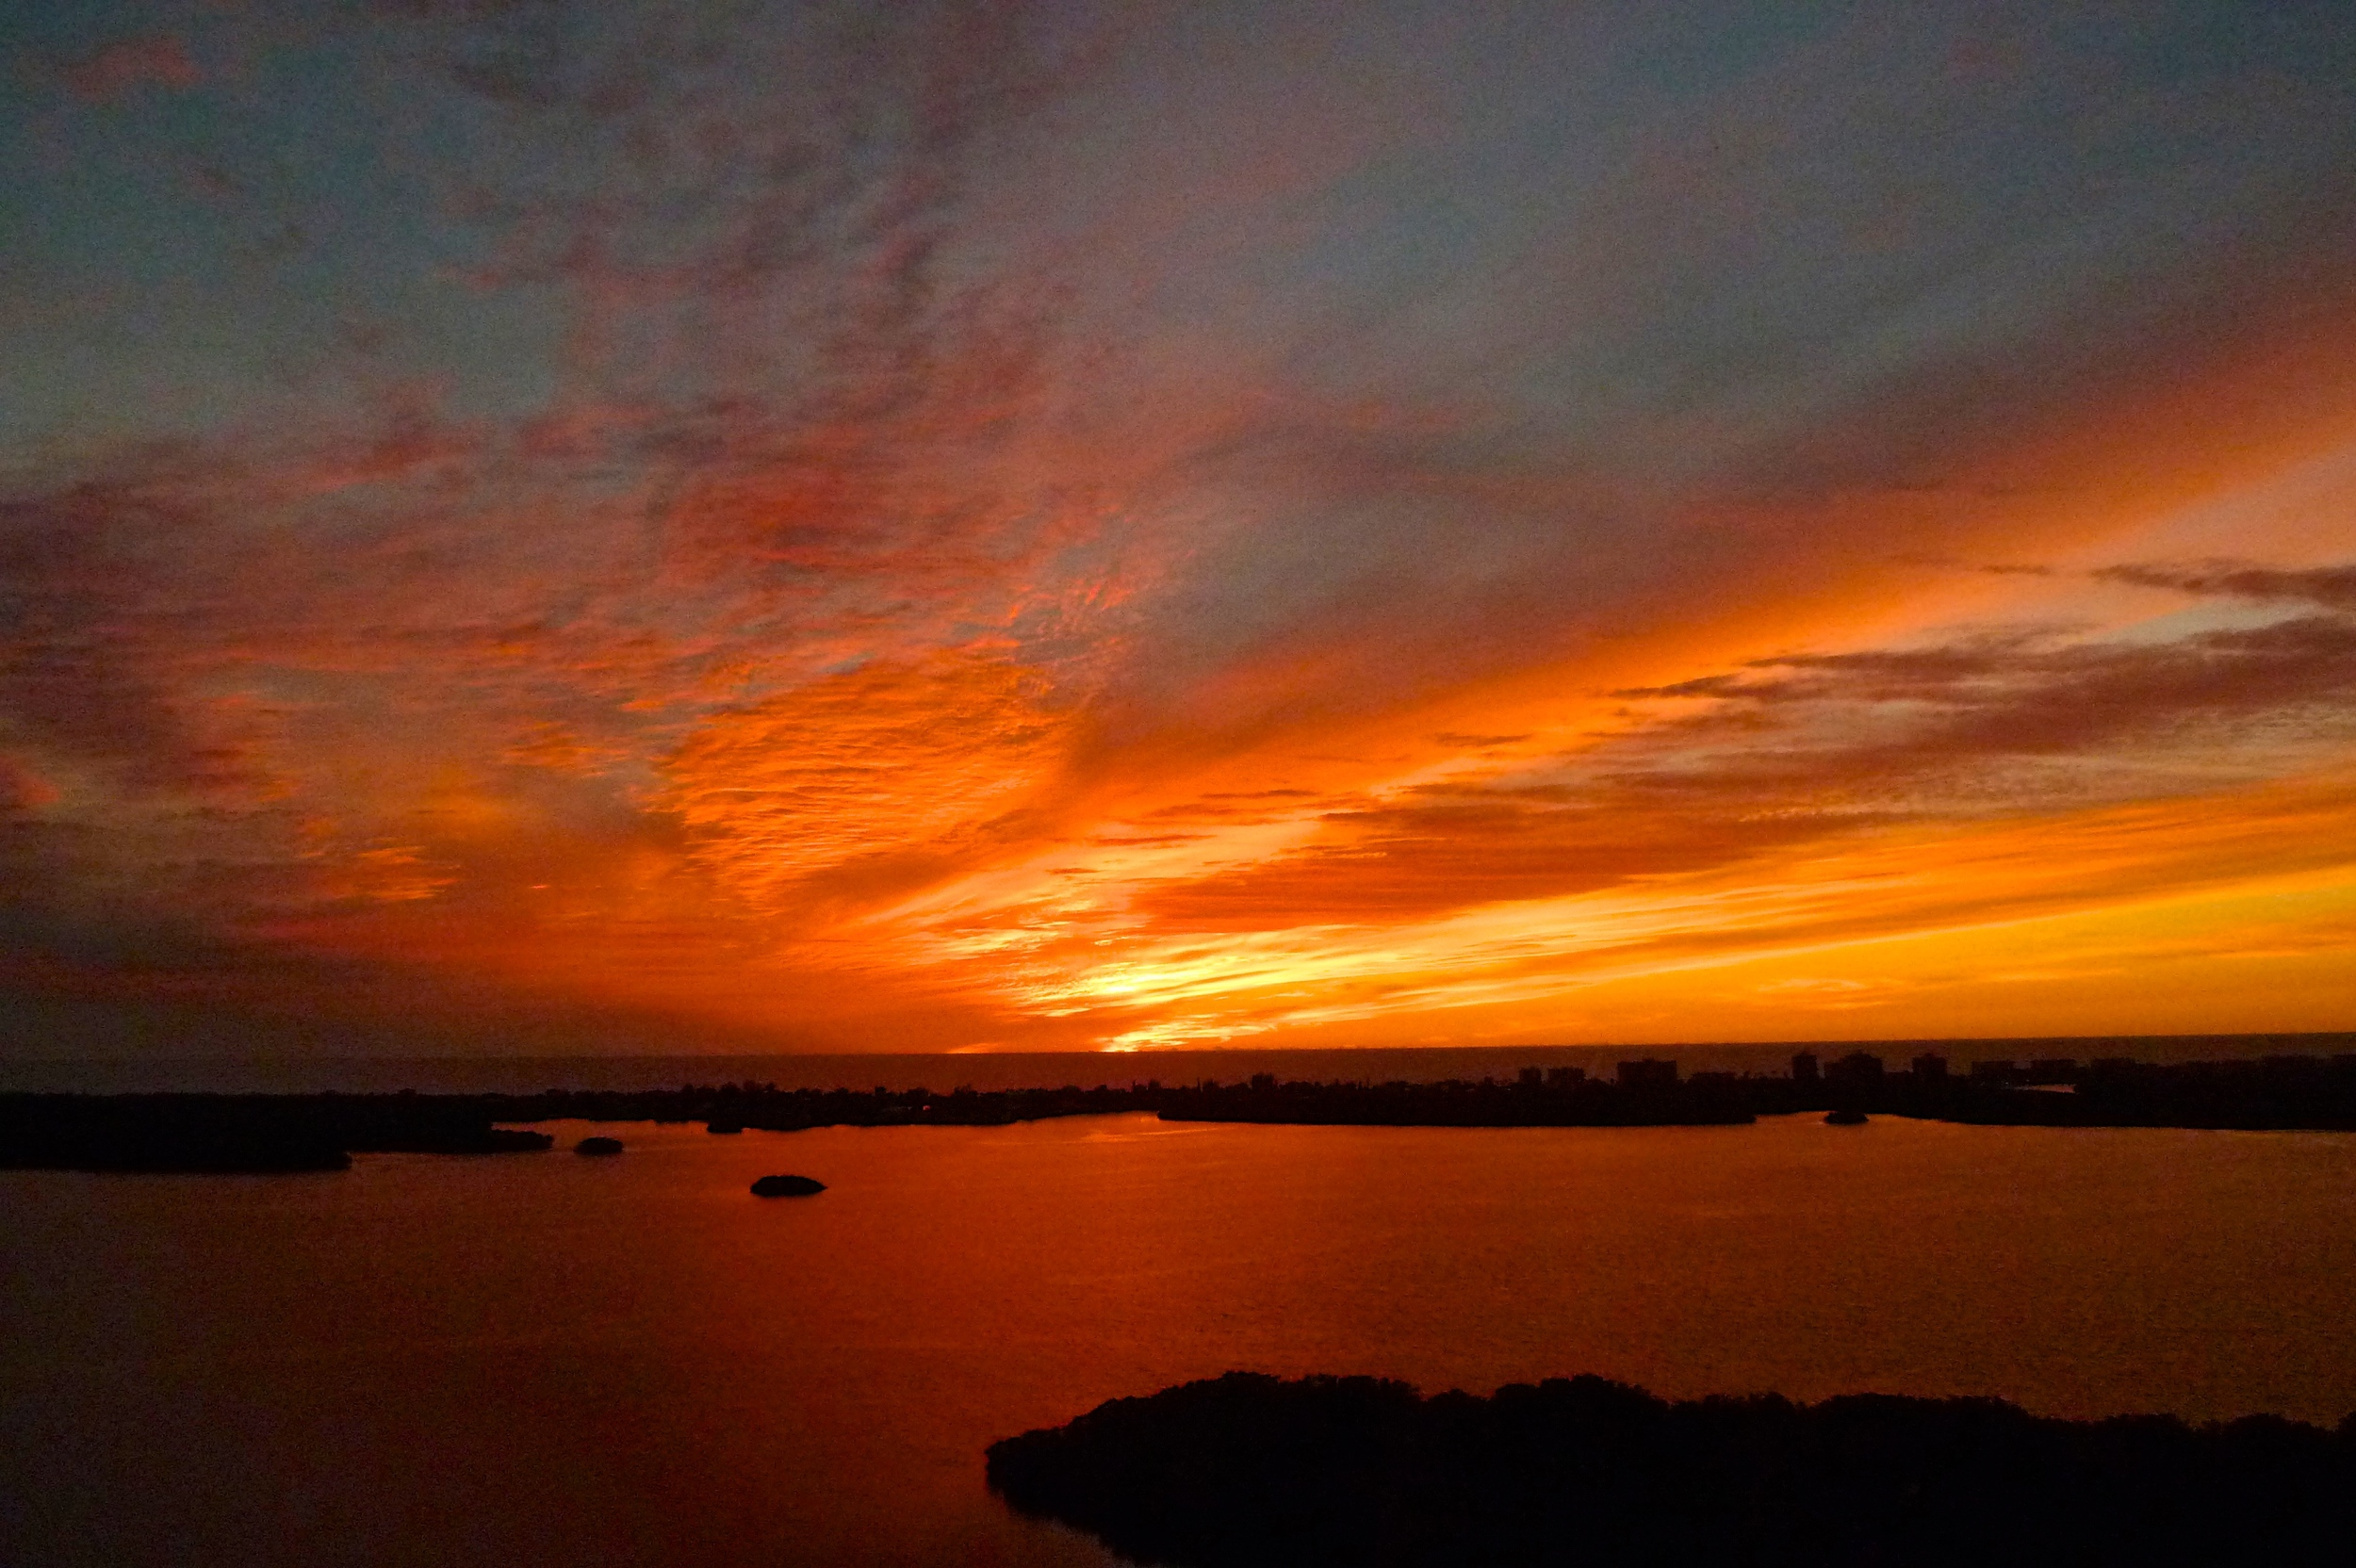 TST_BonitaBay_Sunset_cindi_photo#2.jpeg